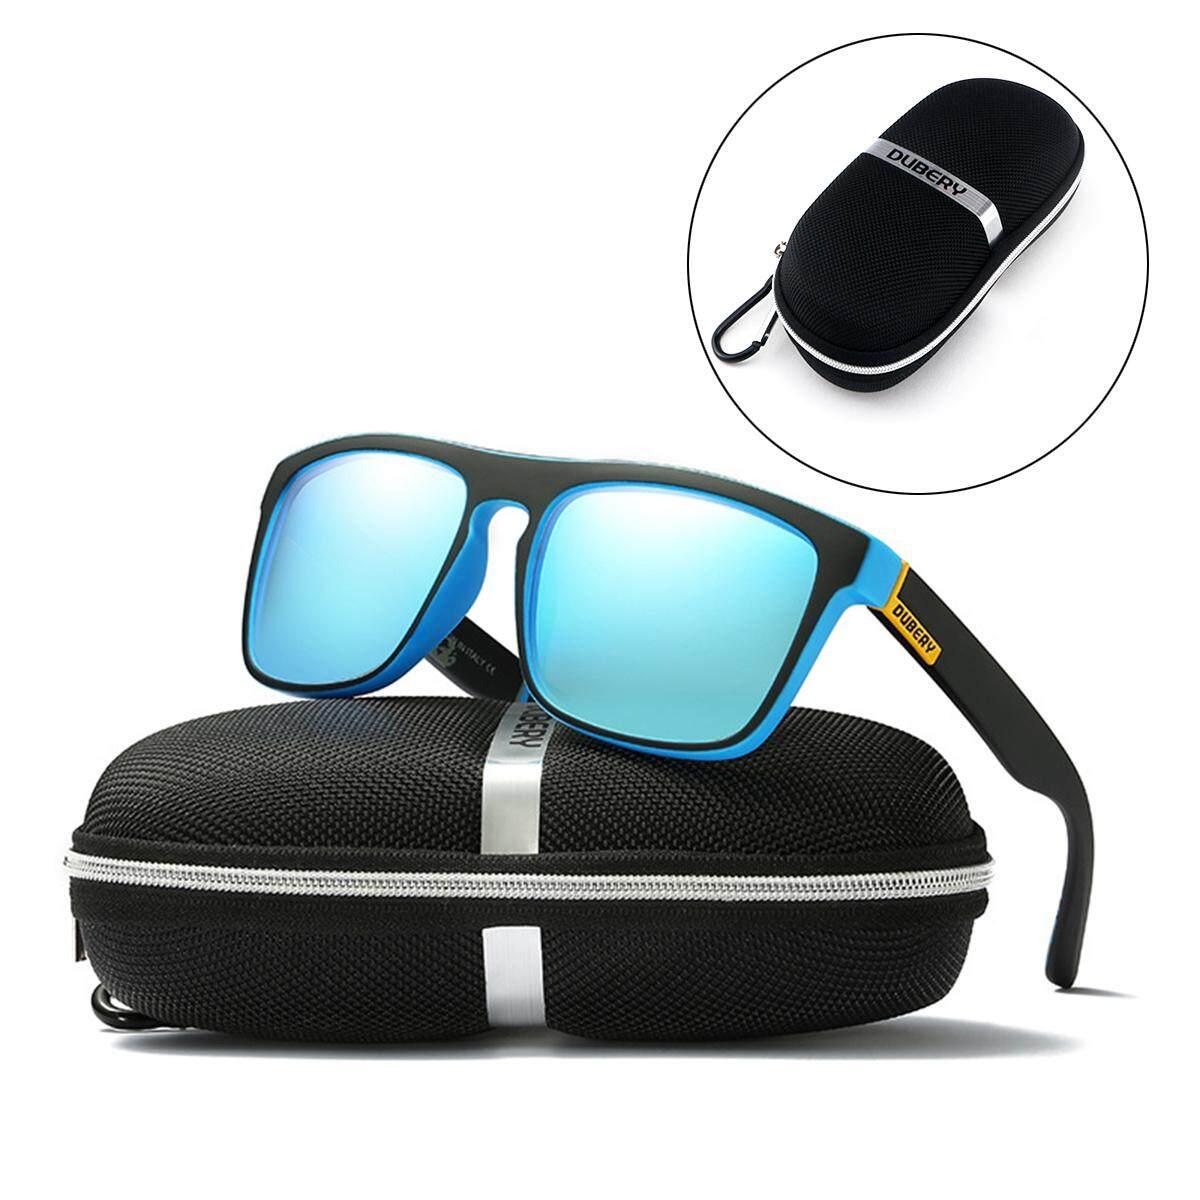 592b34052b6e5 DUBERY Sunglasses Box Glasses Zipper Case Bag Pouch w  Cloth Polarized Test  Card - intl